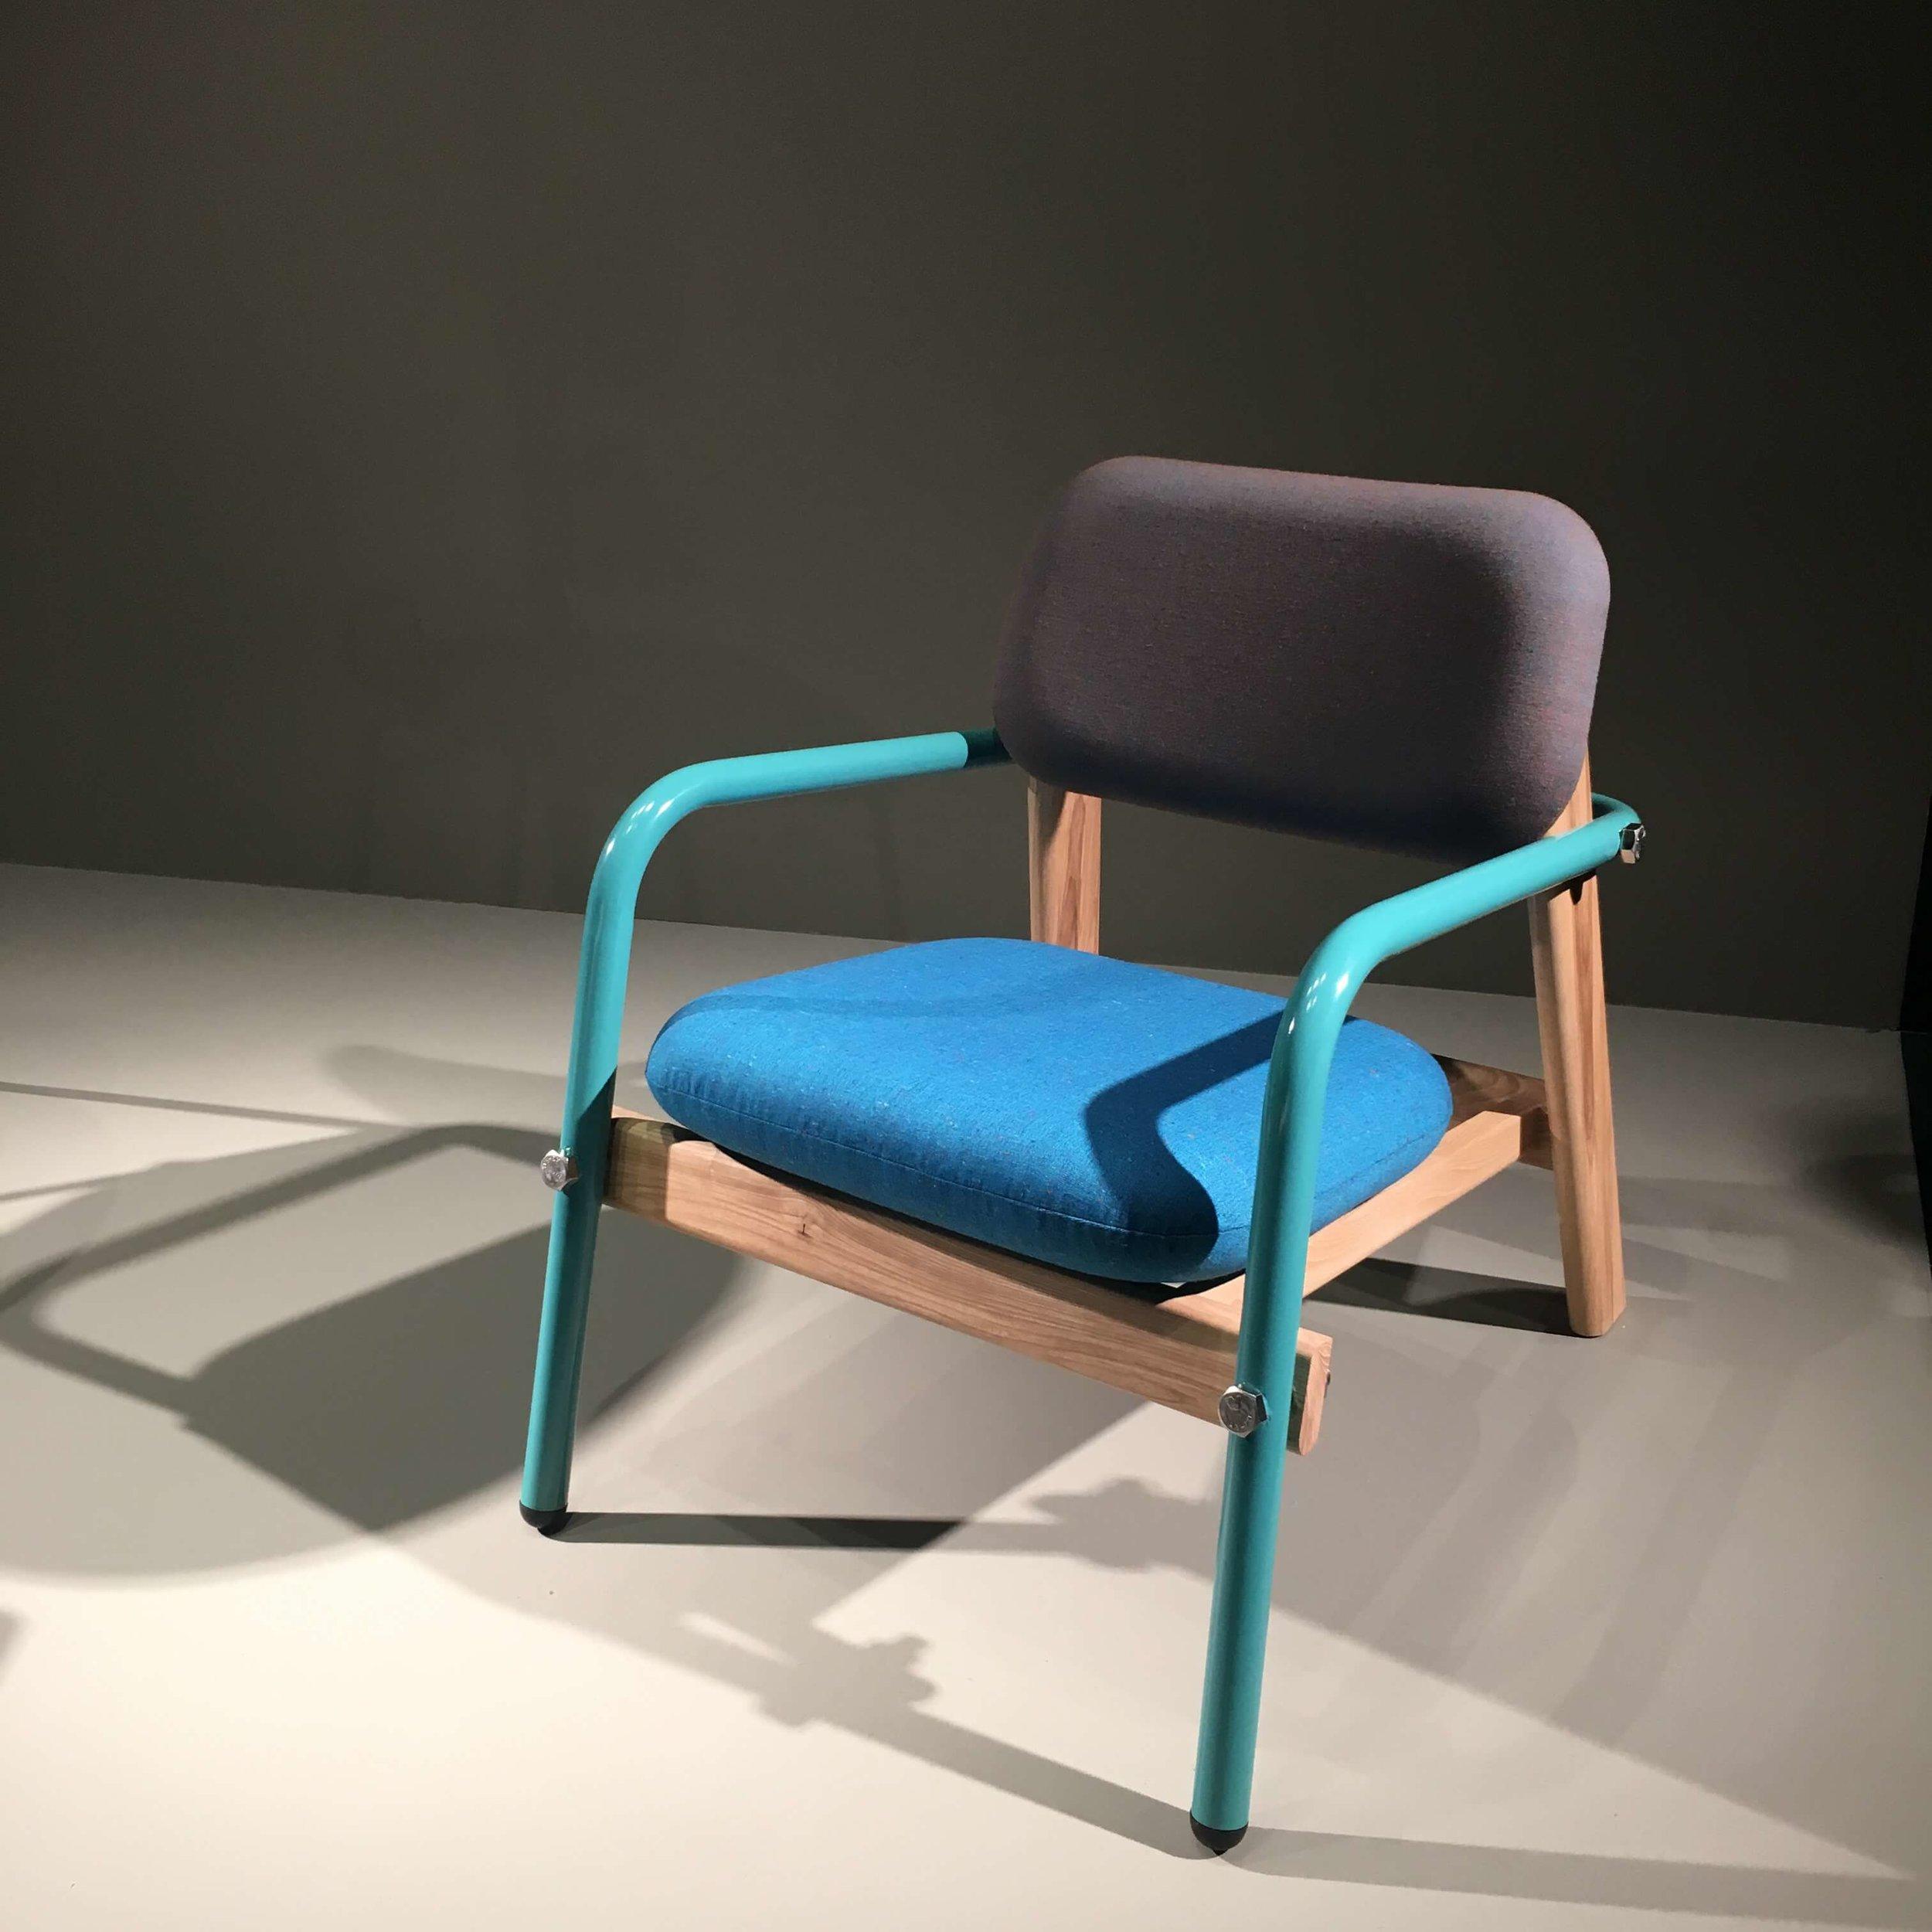 Billy Chair, dreifache Materialkombination, Pure Talent Joe Smith